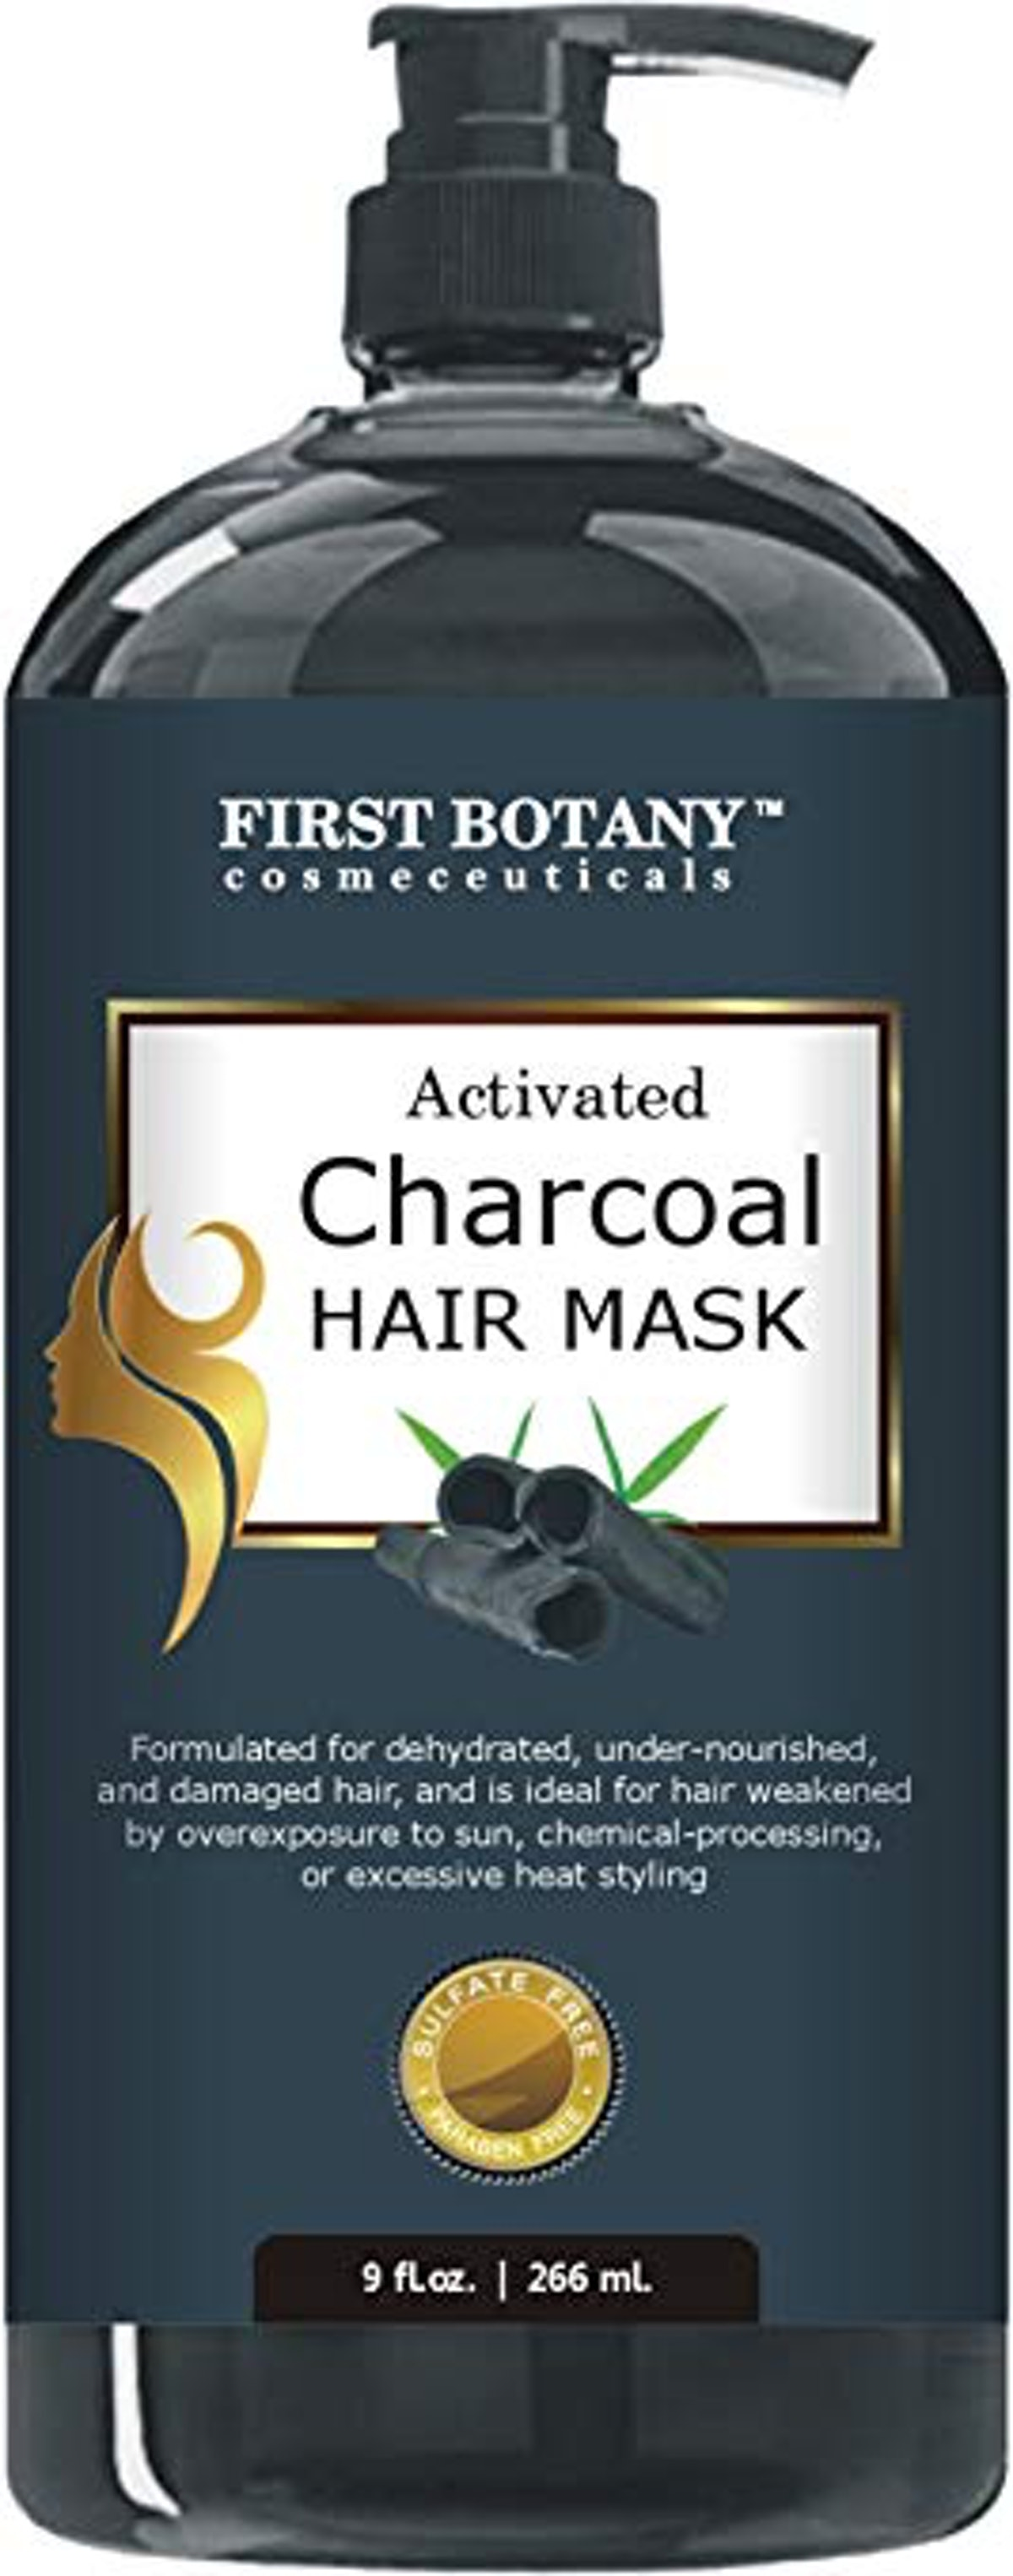 First Botany Cosmeceuticals Detoxifying Hair Mask